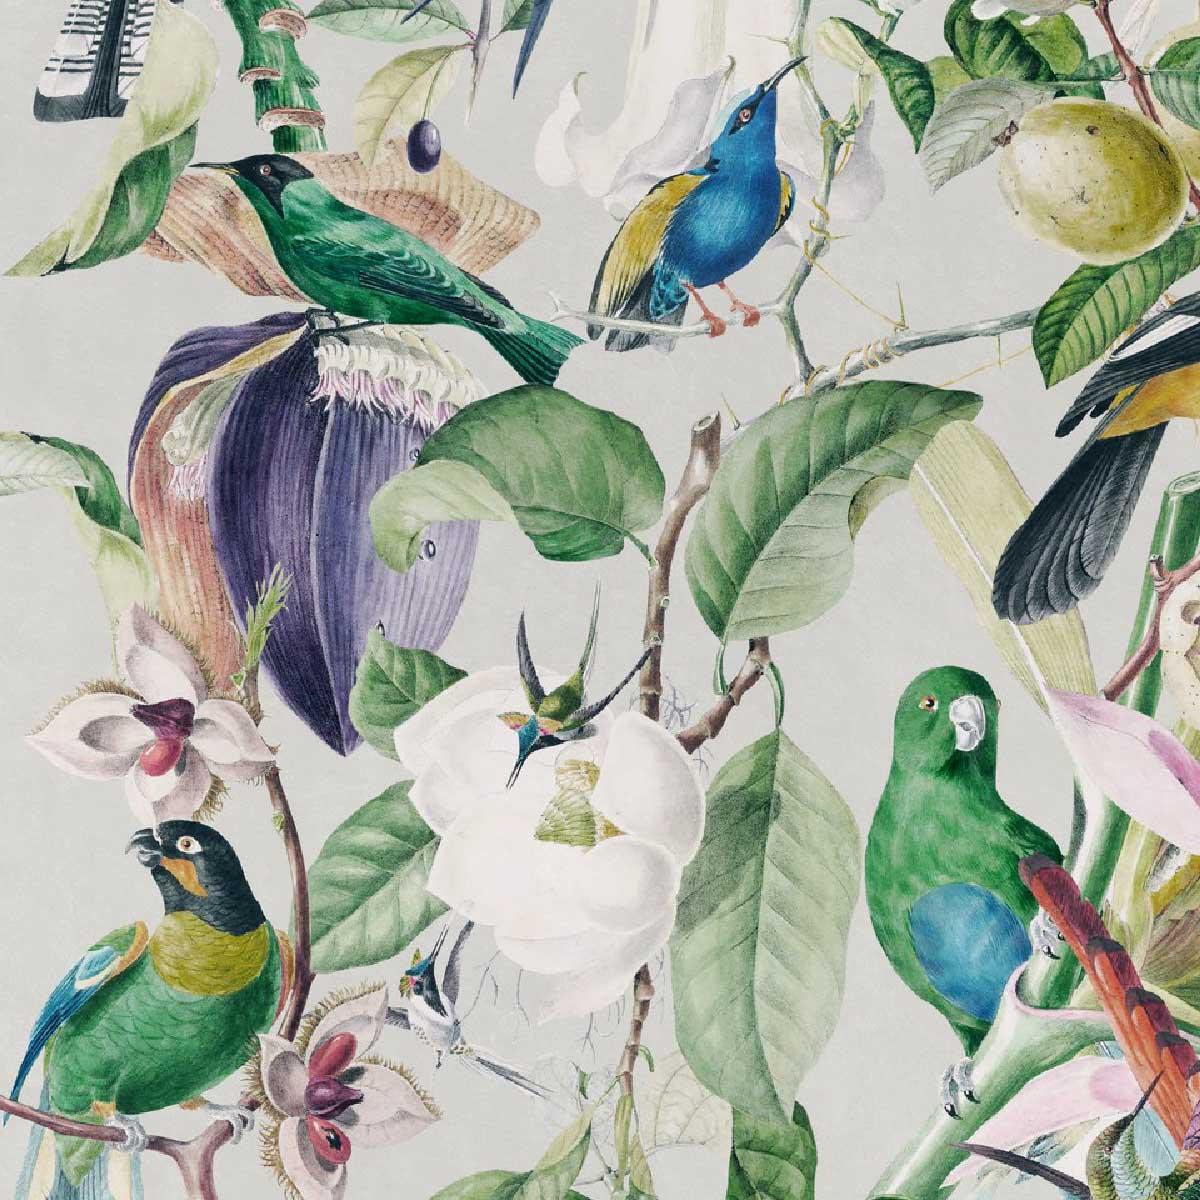 Papier Peint Tropical Birds Mindthegap